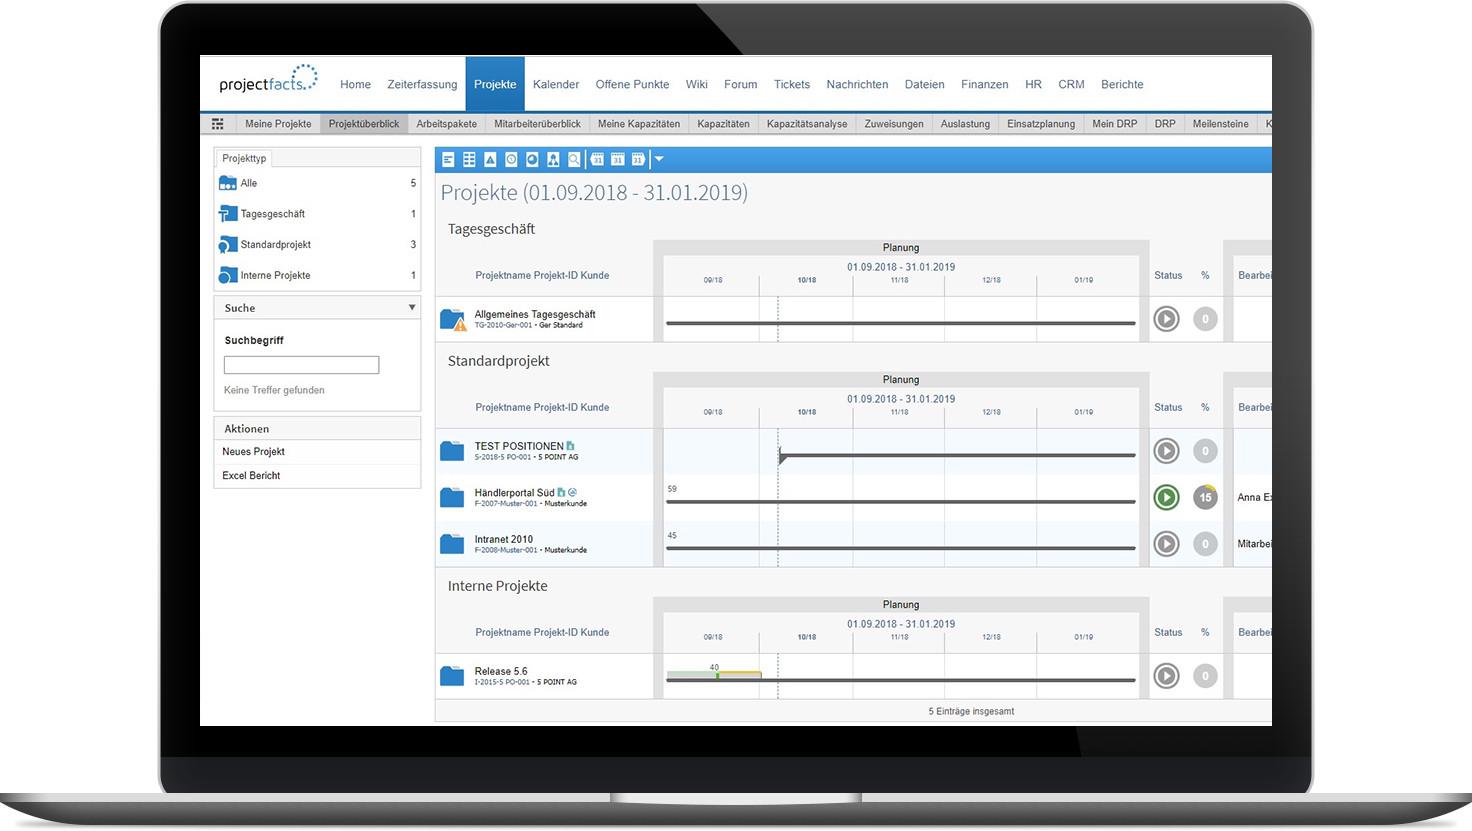 Multiprojektmanagement mit projectfacts